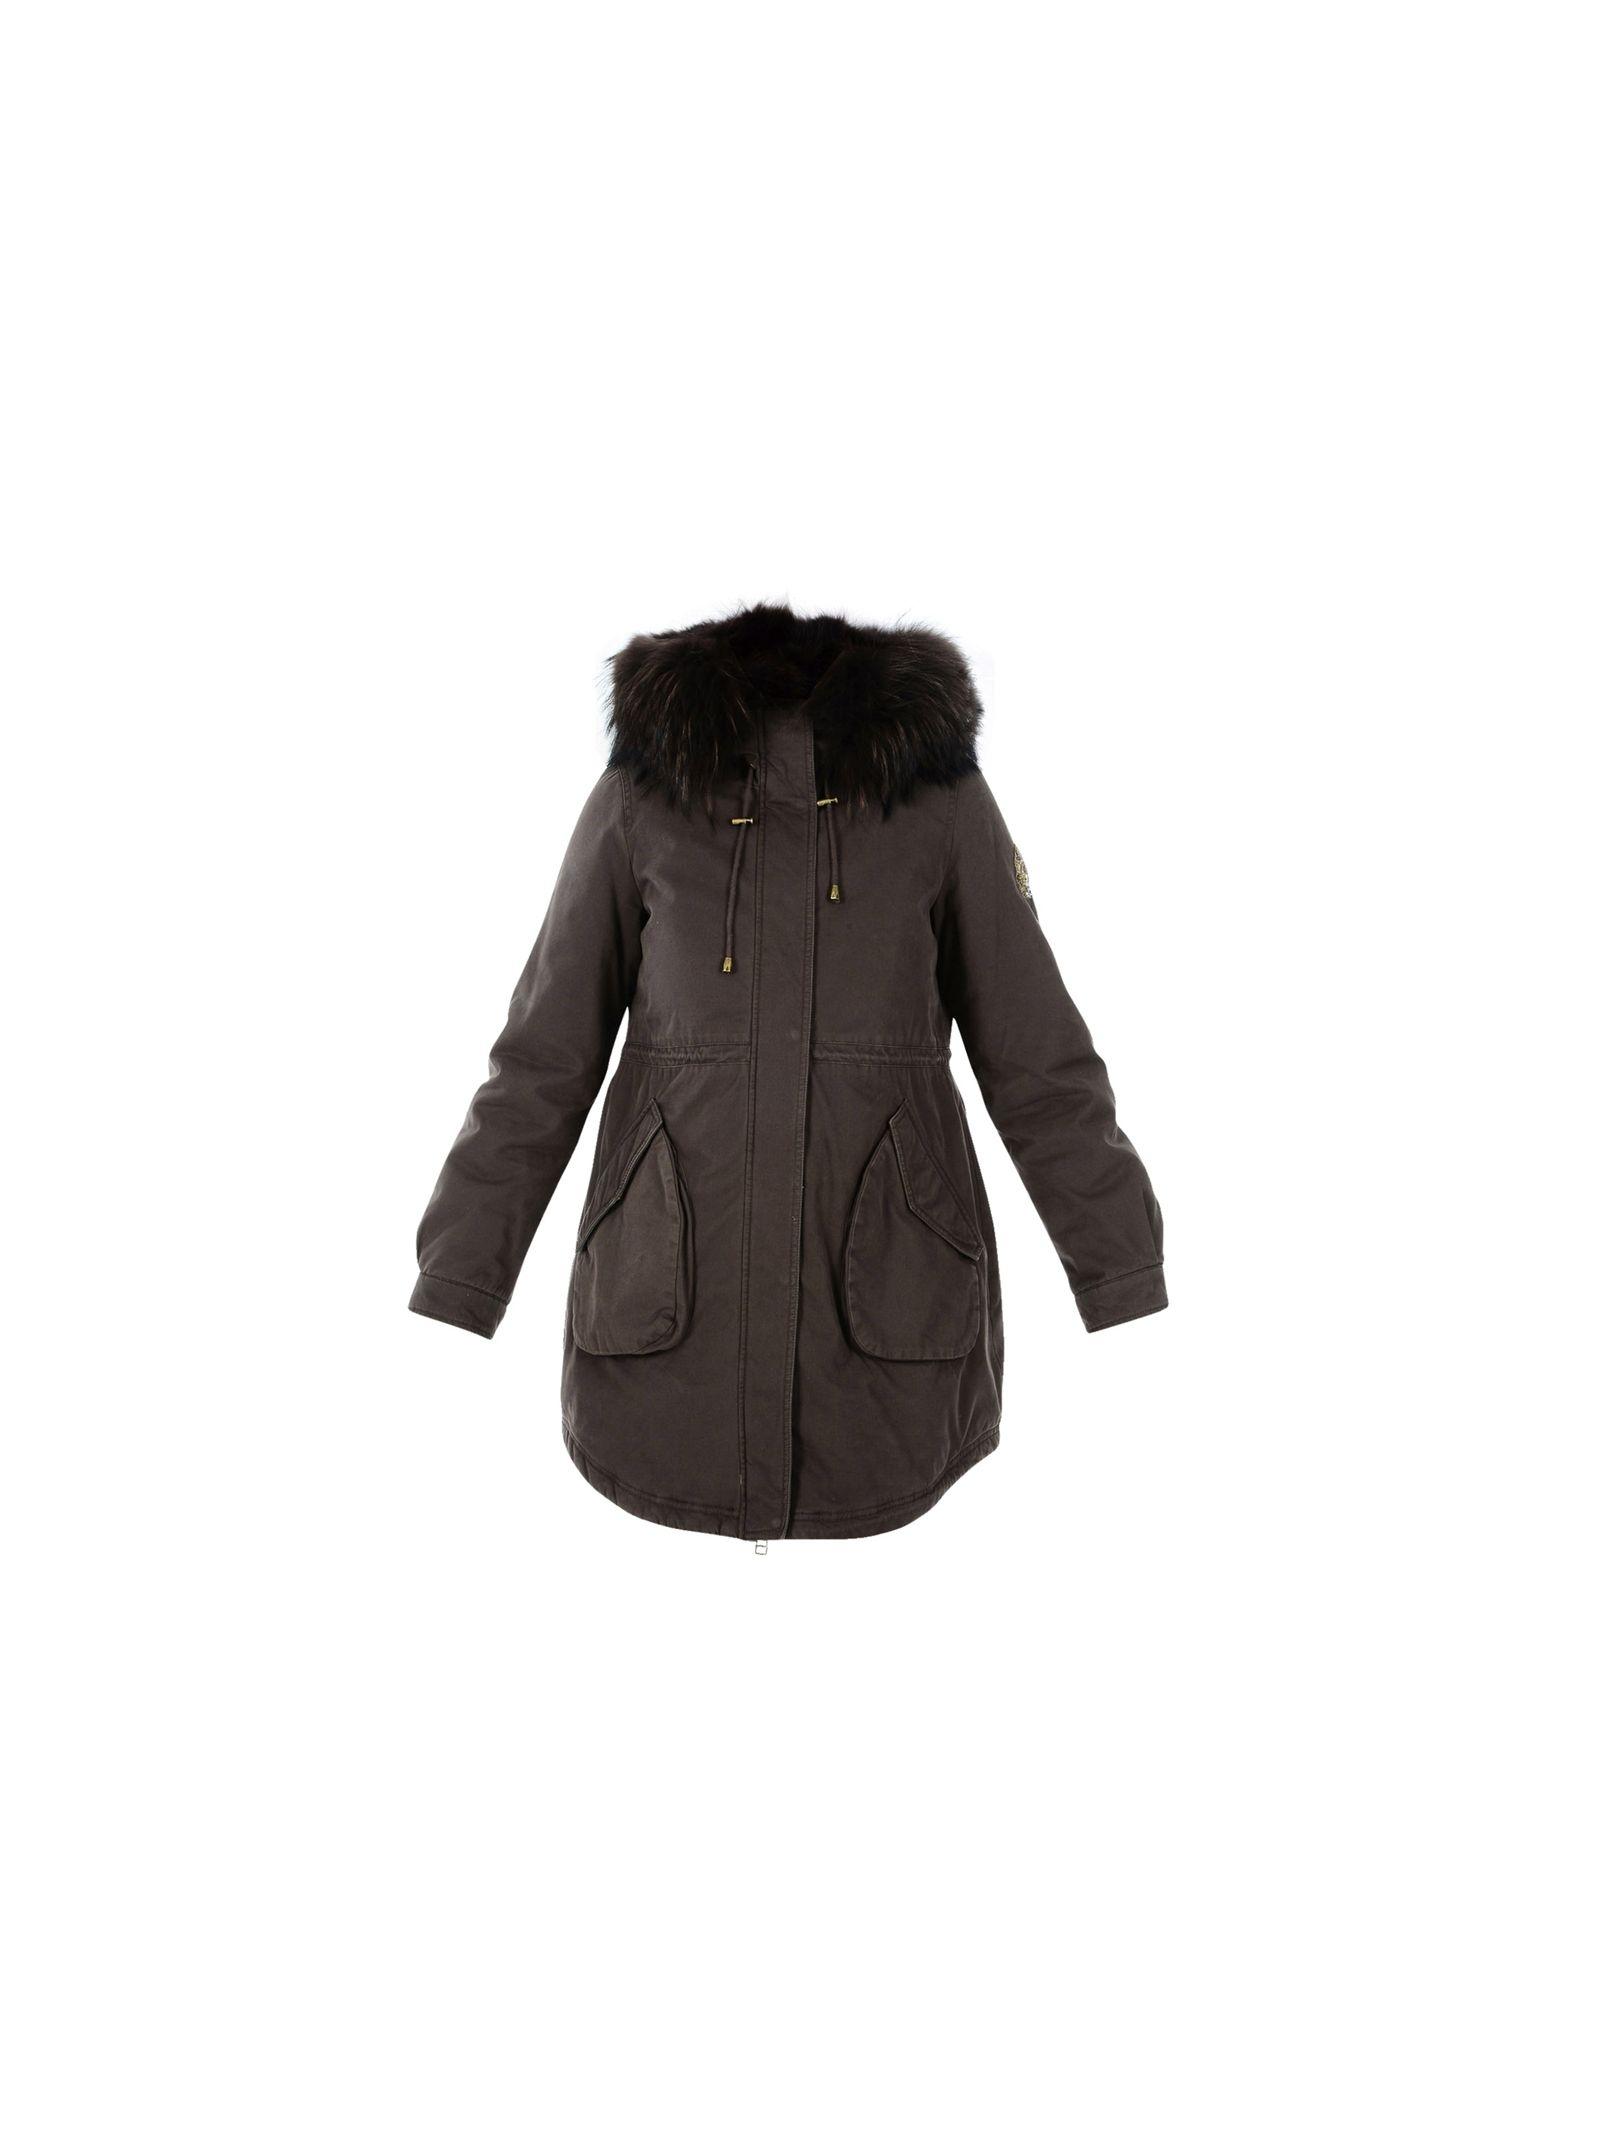 Alessandra Chamonix Fur Detail Parka Coat